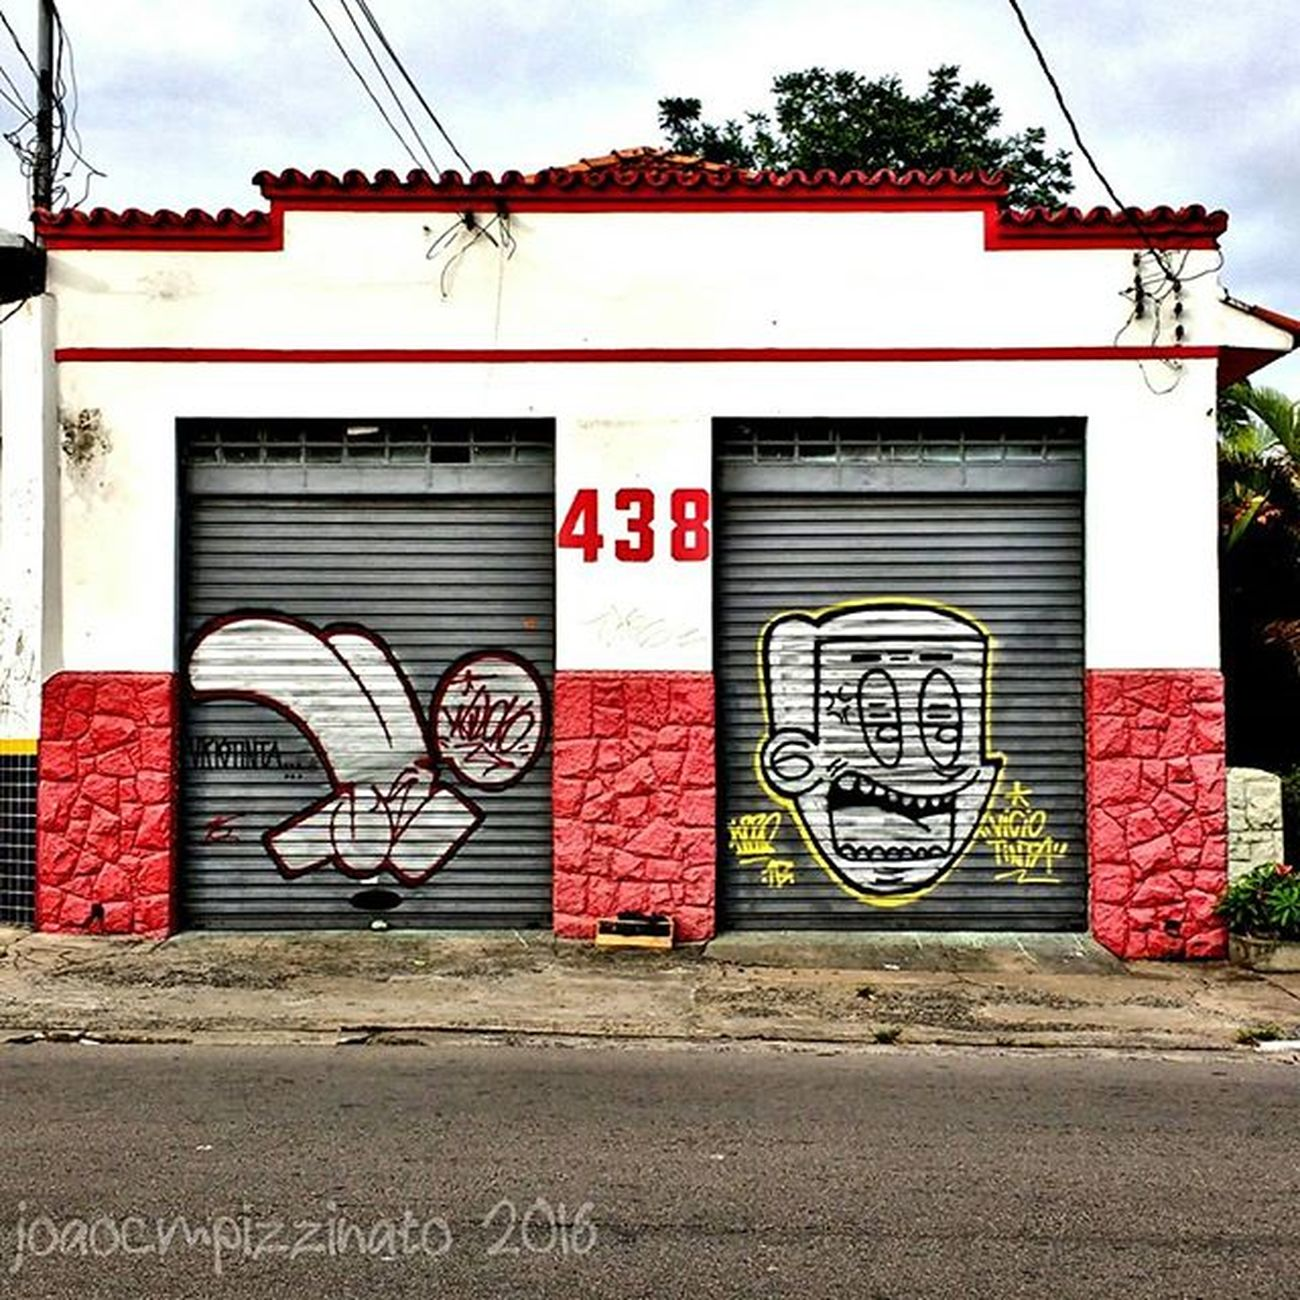 Building_shotz Graffiti Graffitiart Art Streetart UrbanART Streetphotography Urban Streetphoto_brasil Colors City Zonasul Saopaulo Brasil Photograph Photography Urbexbrasil Urbexsp Nasruasdesp011 Mundoruasp Olhonaruasp Flaming_abstracts